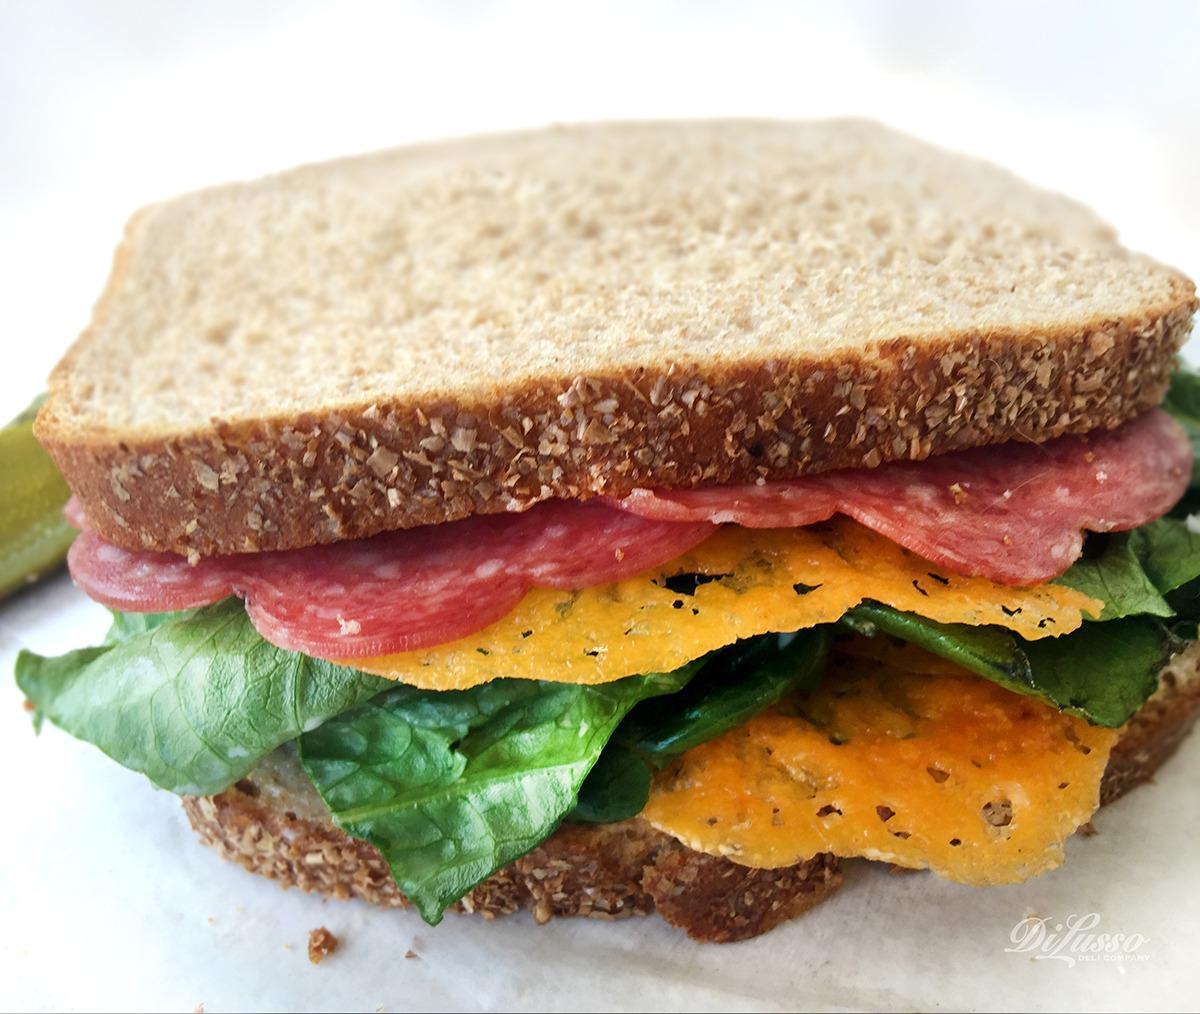 DI LUSSO™ Fan Sandwich: The Niko Frico